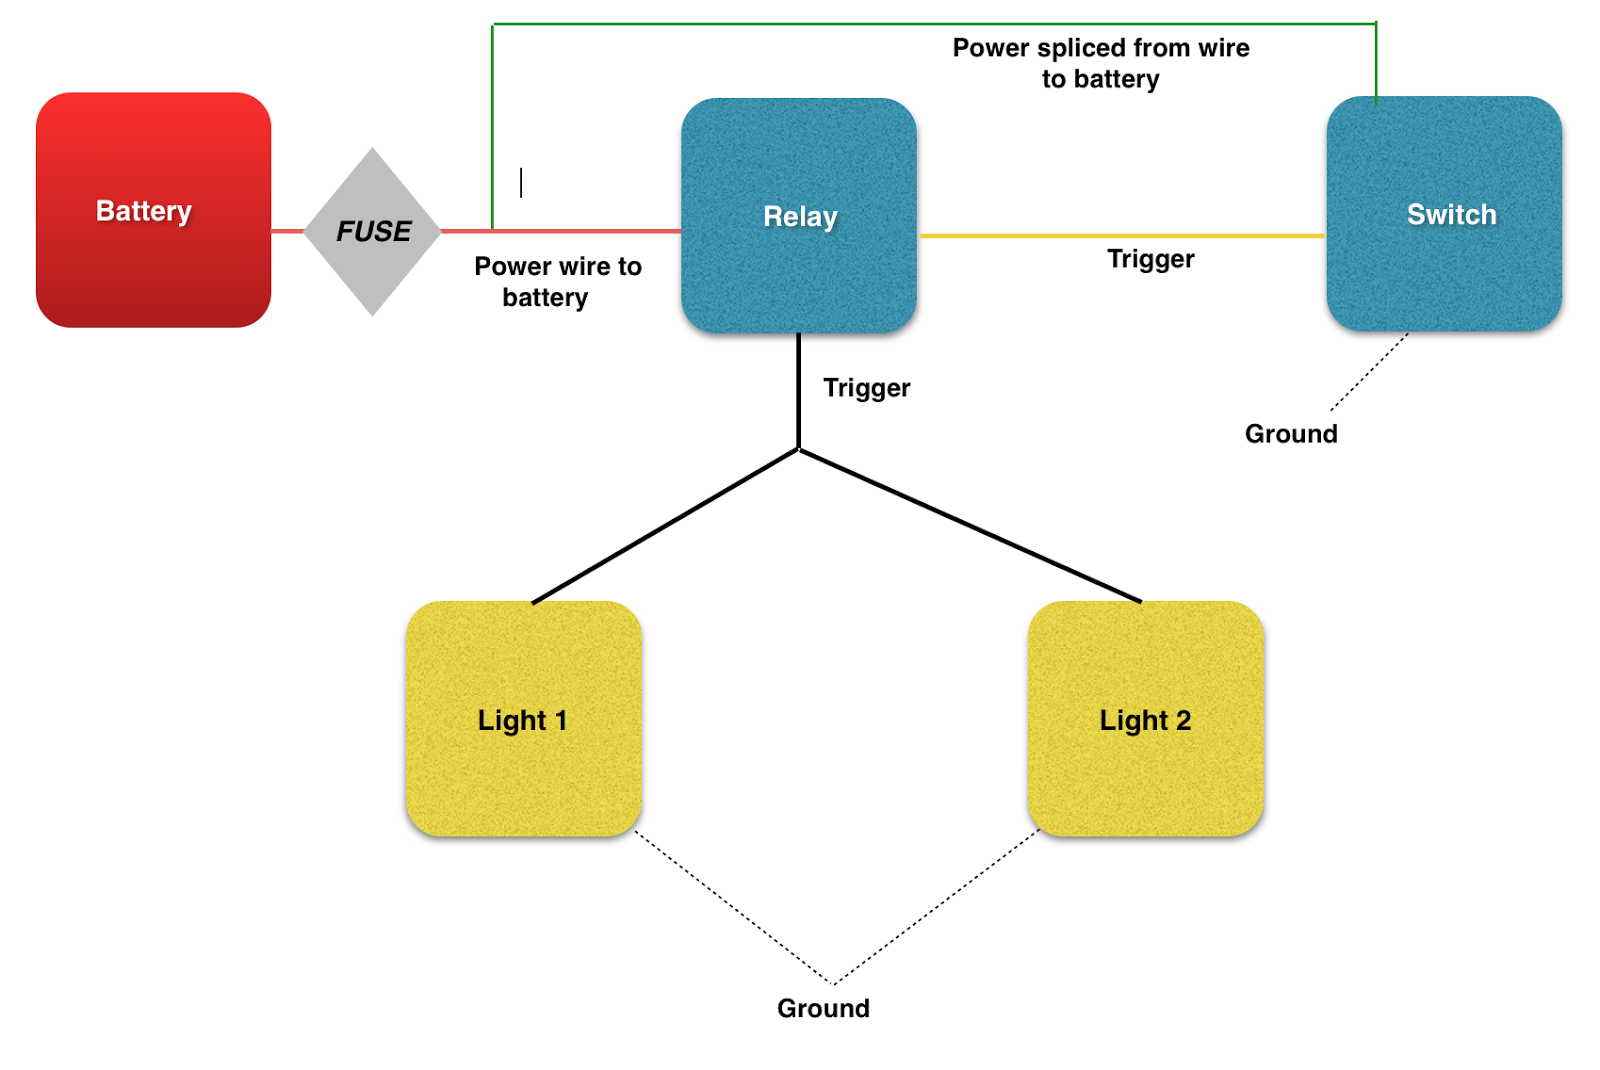 small resolution of hazard flasher diagrams u hella picturesque png 1600x1070 hazard flasher diagrams u2022 hella picturesque